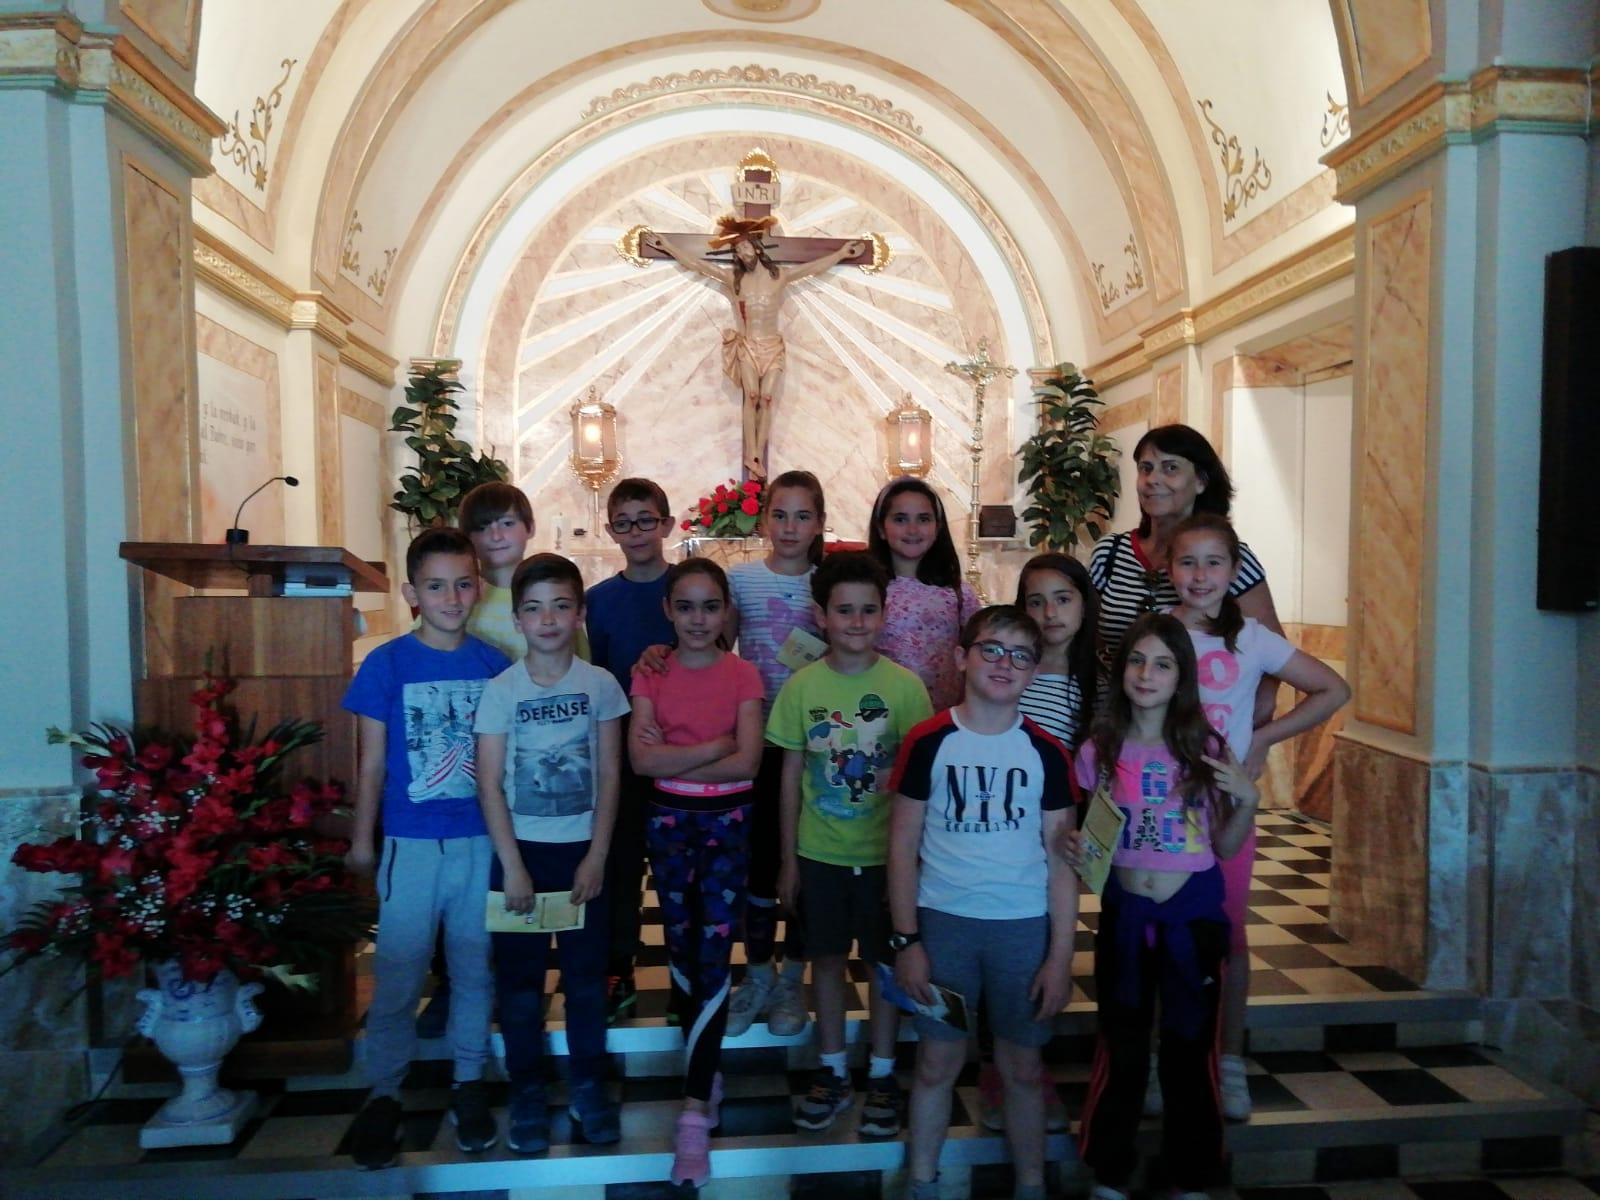 (2019-05-23) Visita ermita alumnos Laura - 3 C primaria - Reina Sofia - María Isabel Berenguer (08)